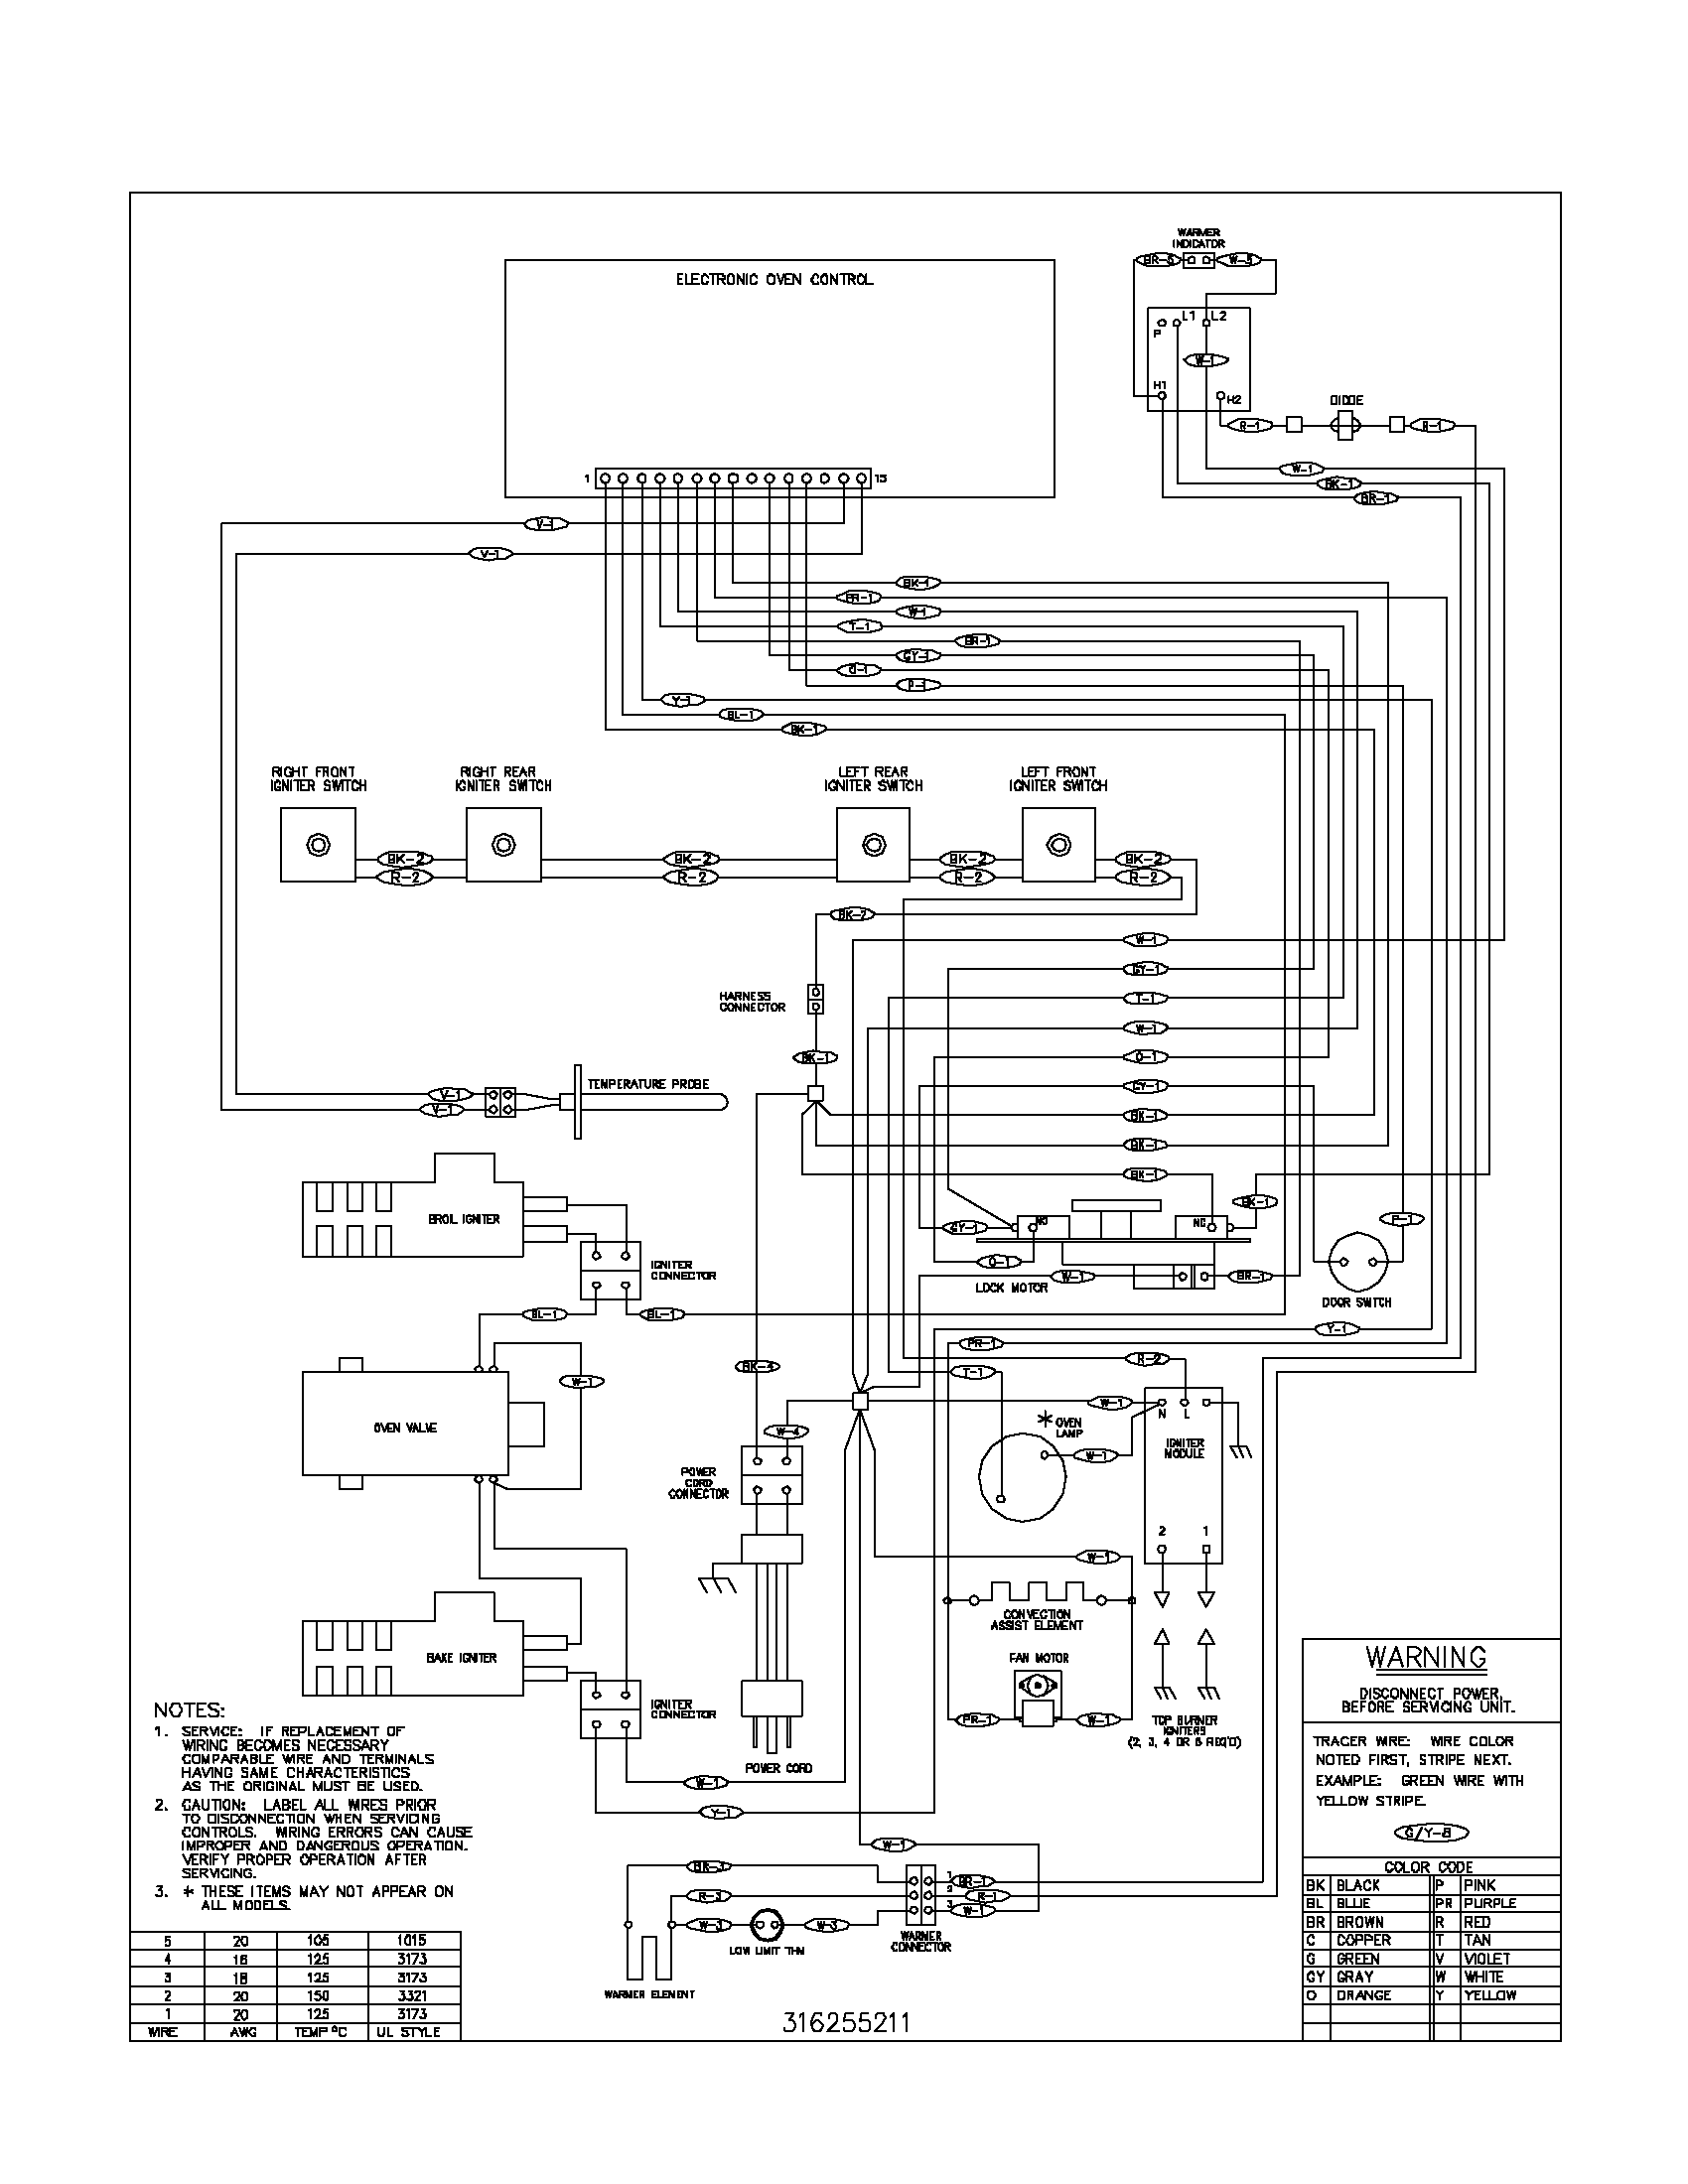 Kitchenaid Dishwasher Wiring Harness Diagram Diagram – Kitchenaid Dishwasher Wiring Harness Diagram